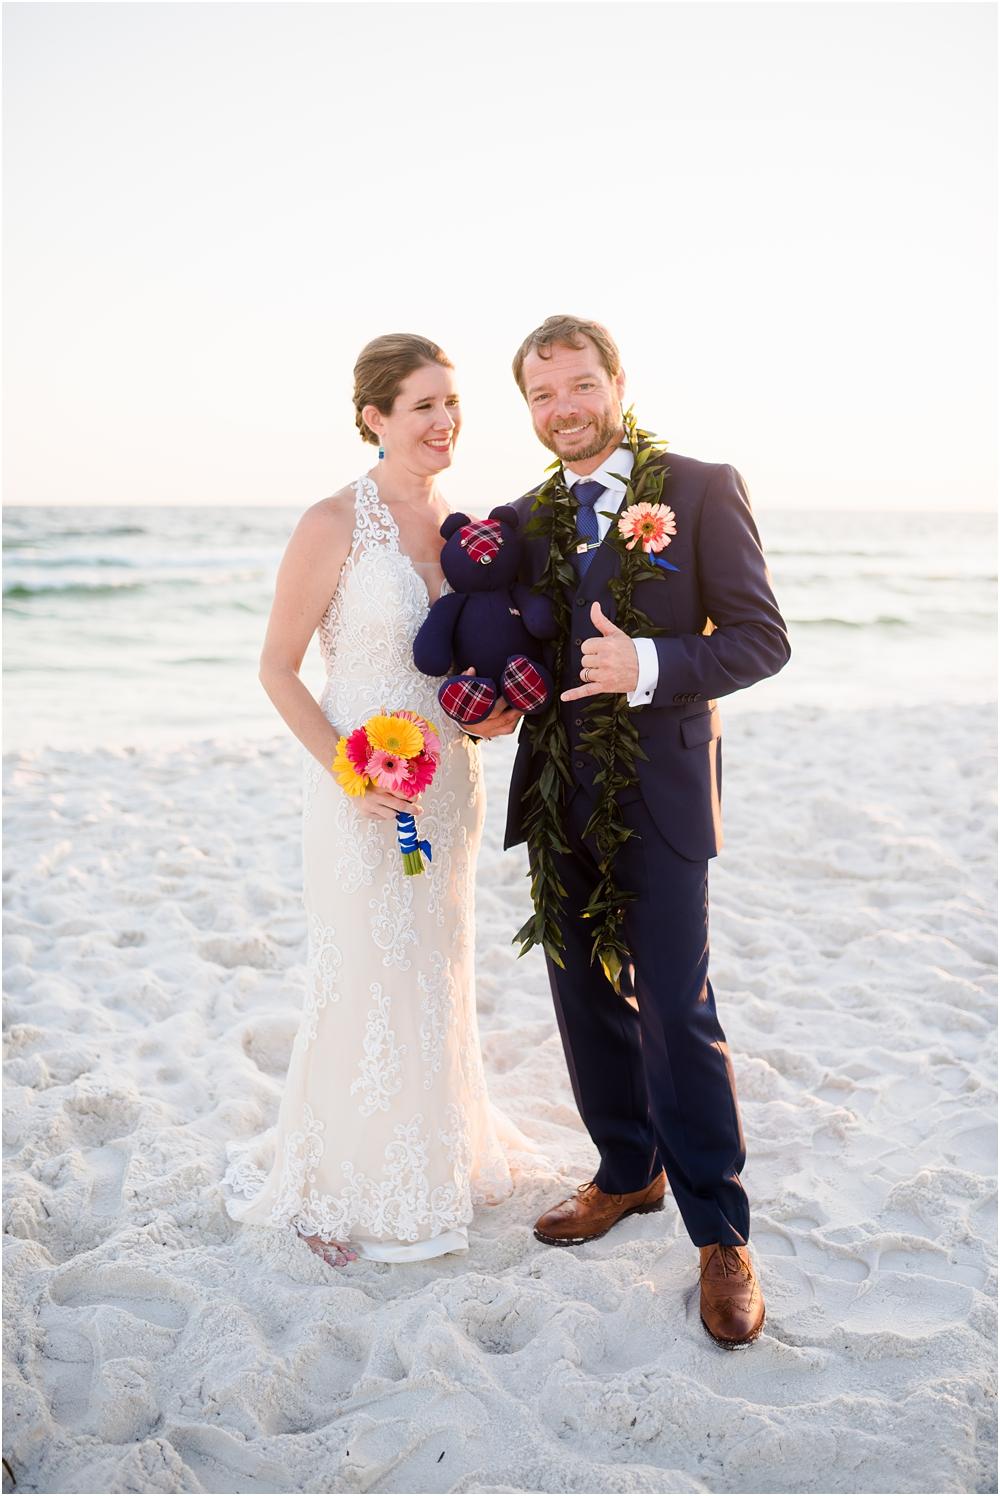 ledman-wedding-kiersten-stevenson-photography-30a-panama-city-beach-dothan-tallahassee-(494-of-763).JPG